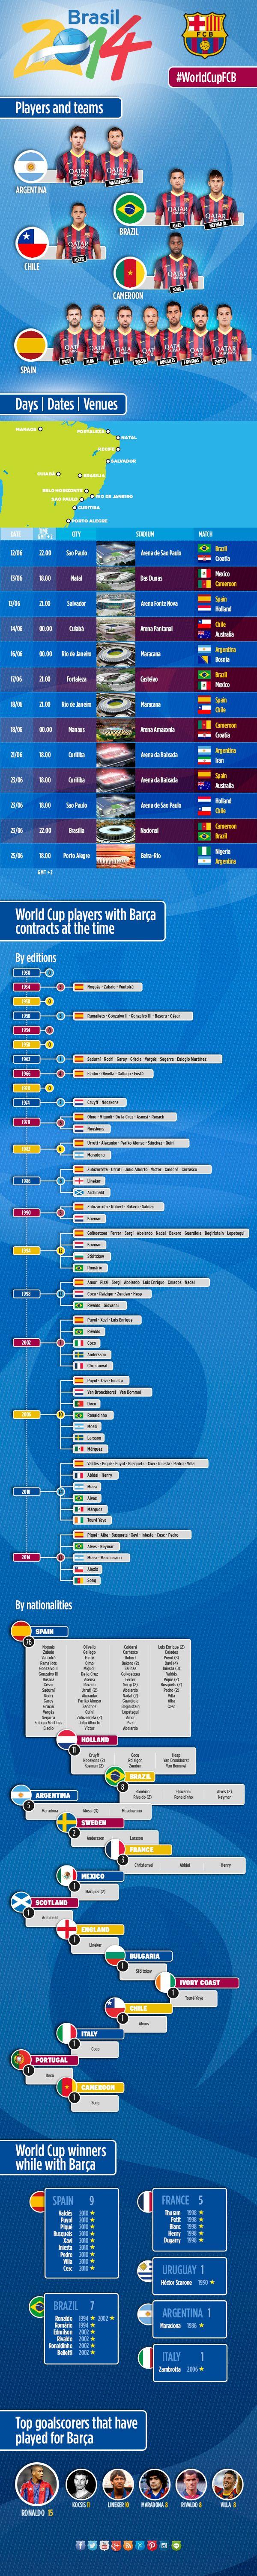 FCBarcelona at the World Cup #Brazil #FCBarcelona #WorldCup2014